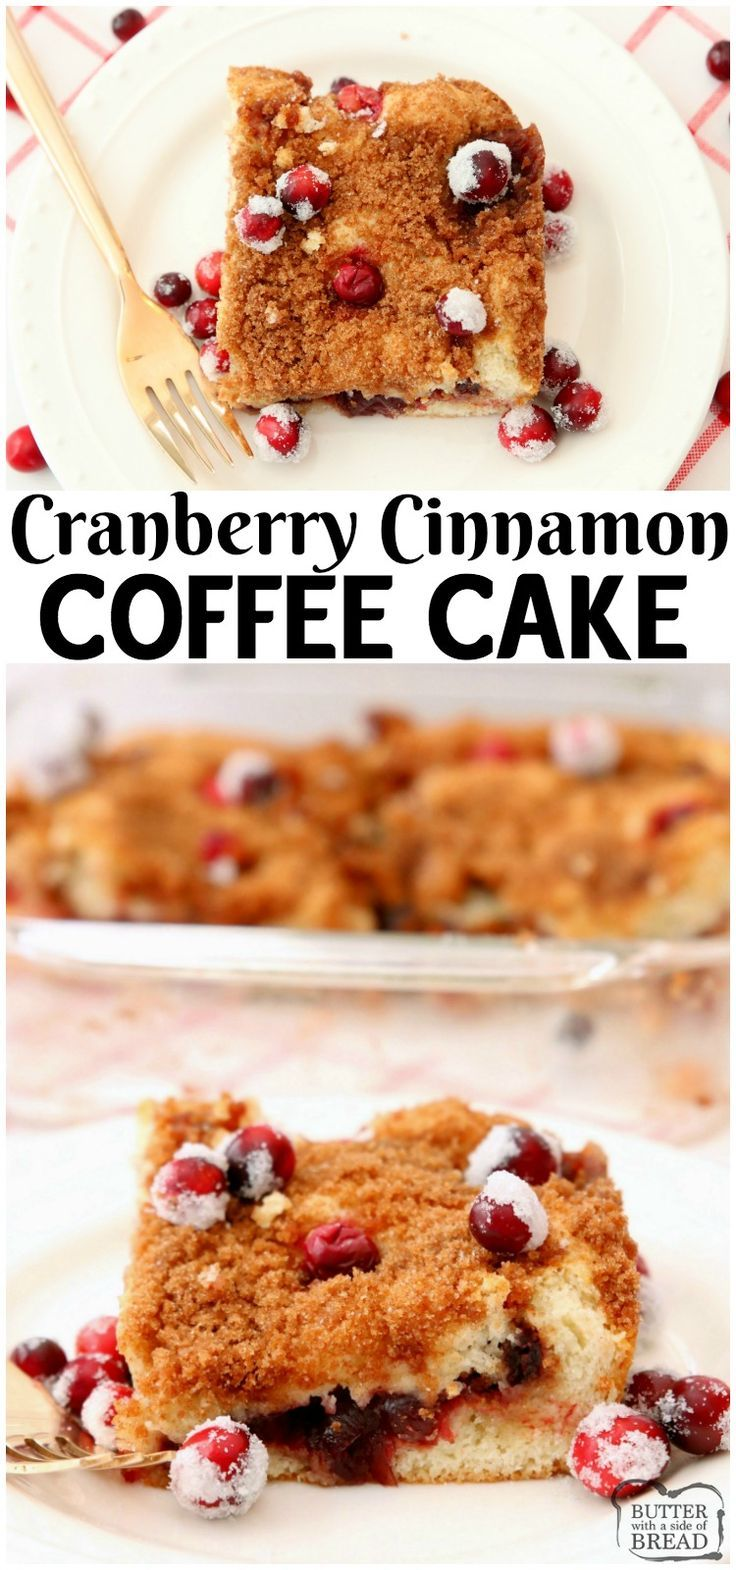 Cranberry Cinnamon Coffee Cake Rezept mit nur 4 Zutaten! Festlich & E ...   - Butter with a Side of Bread -